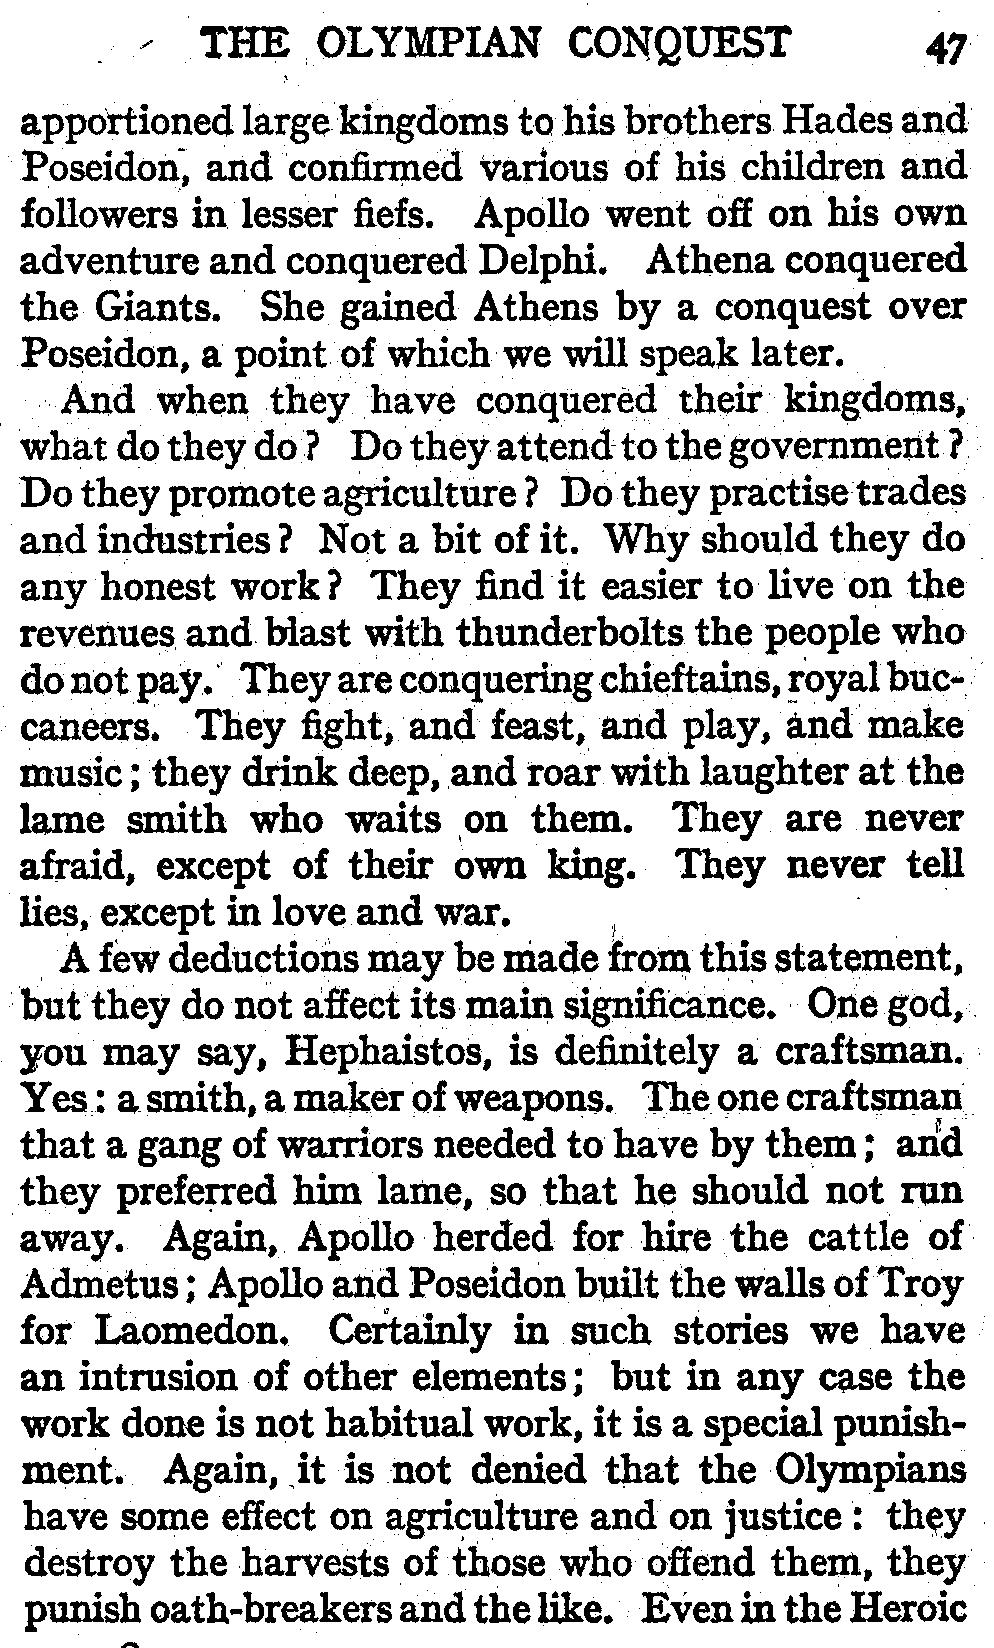 5 paragraph essay on poseidon